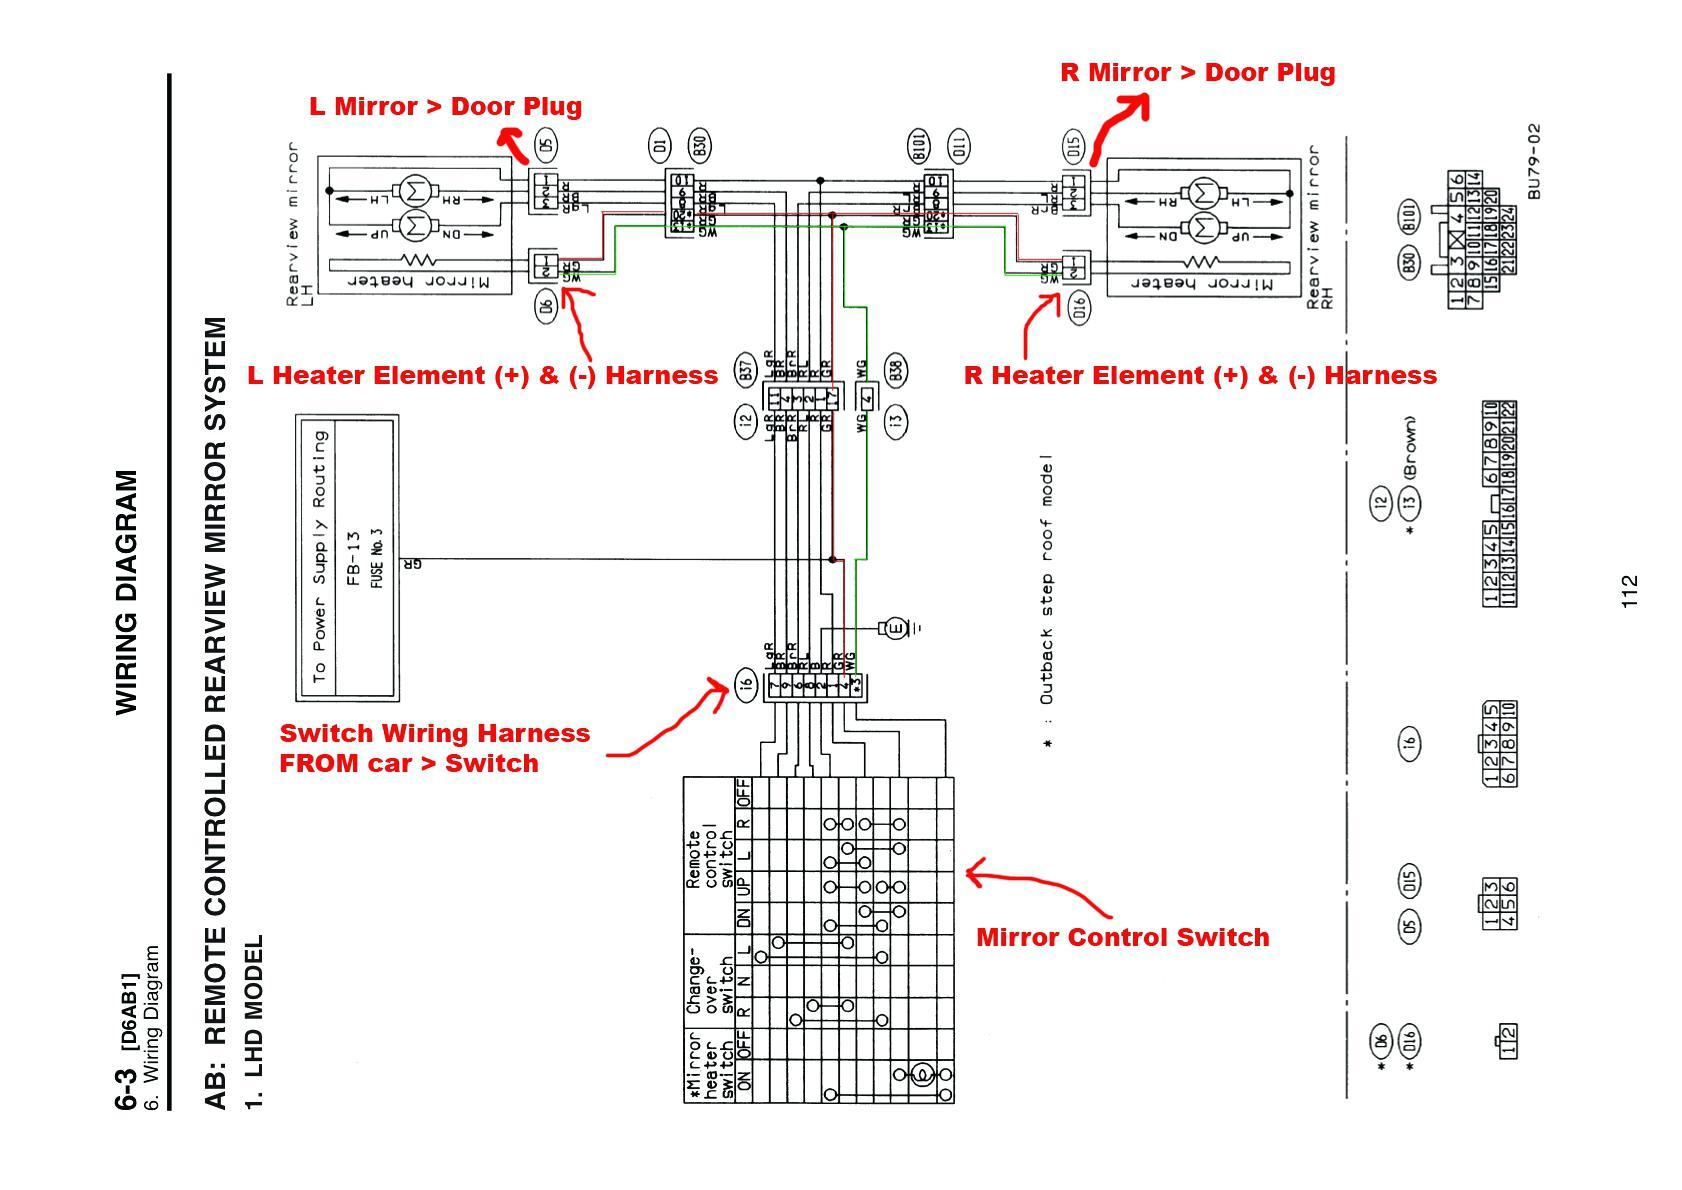 OF_4922] Eaton Atc 600 Wiring Diagram Free Diagram